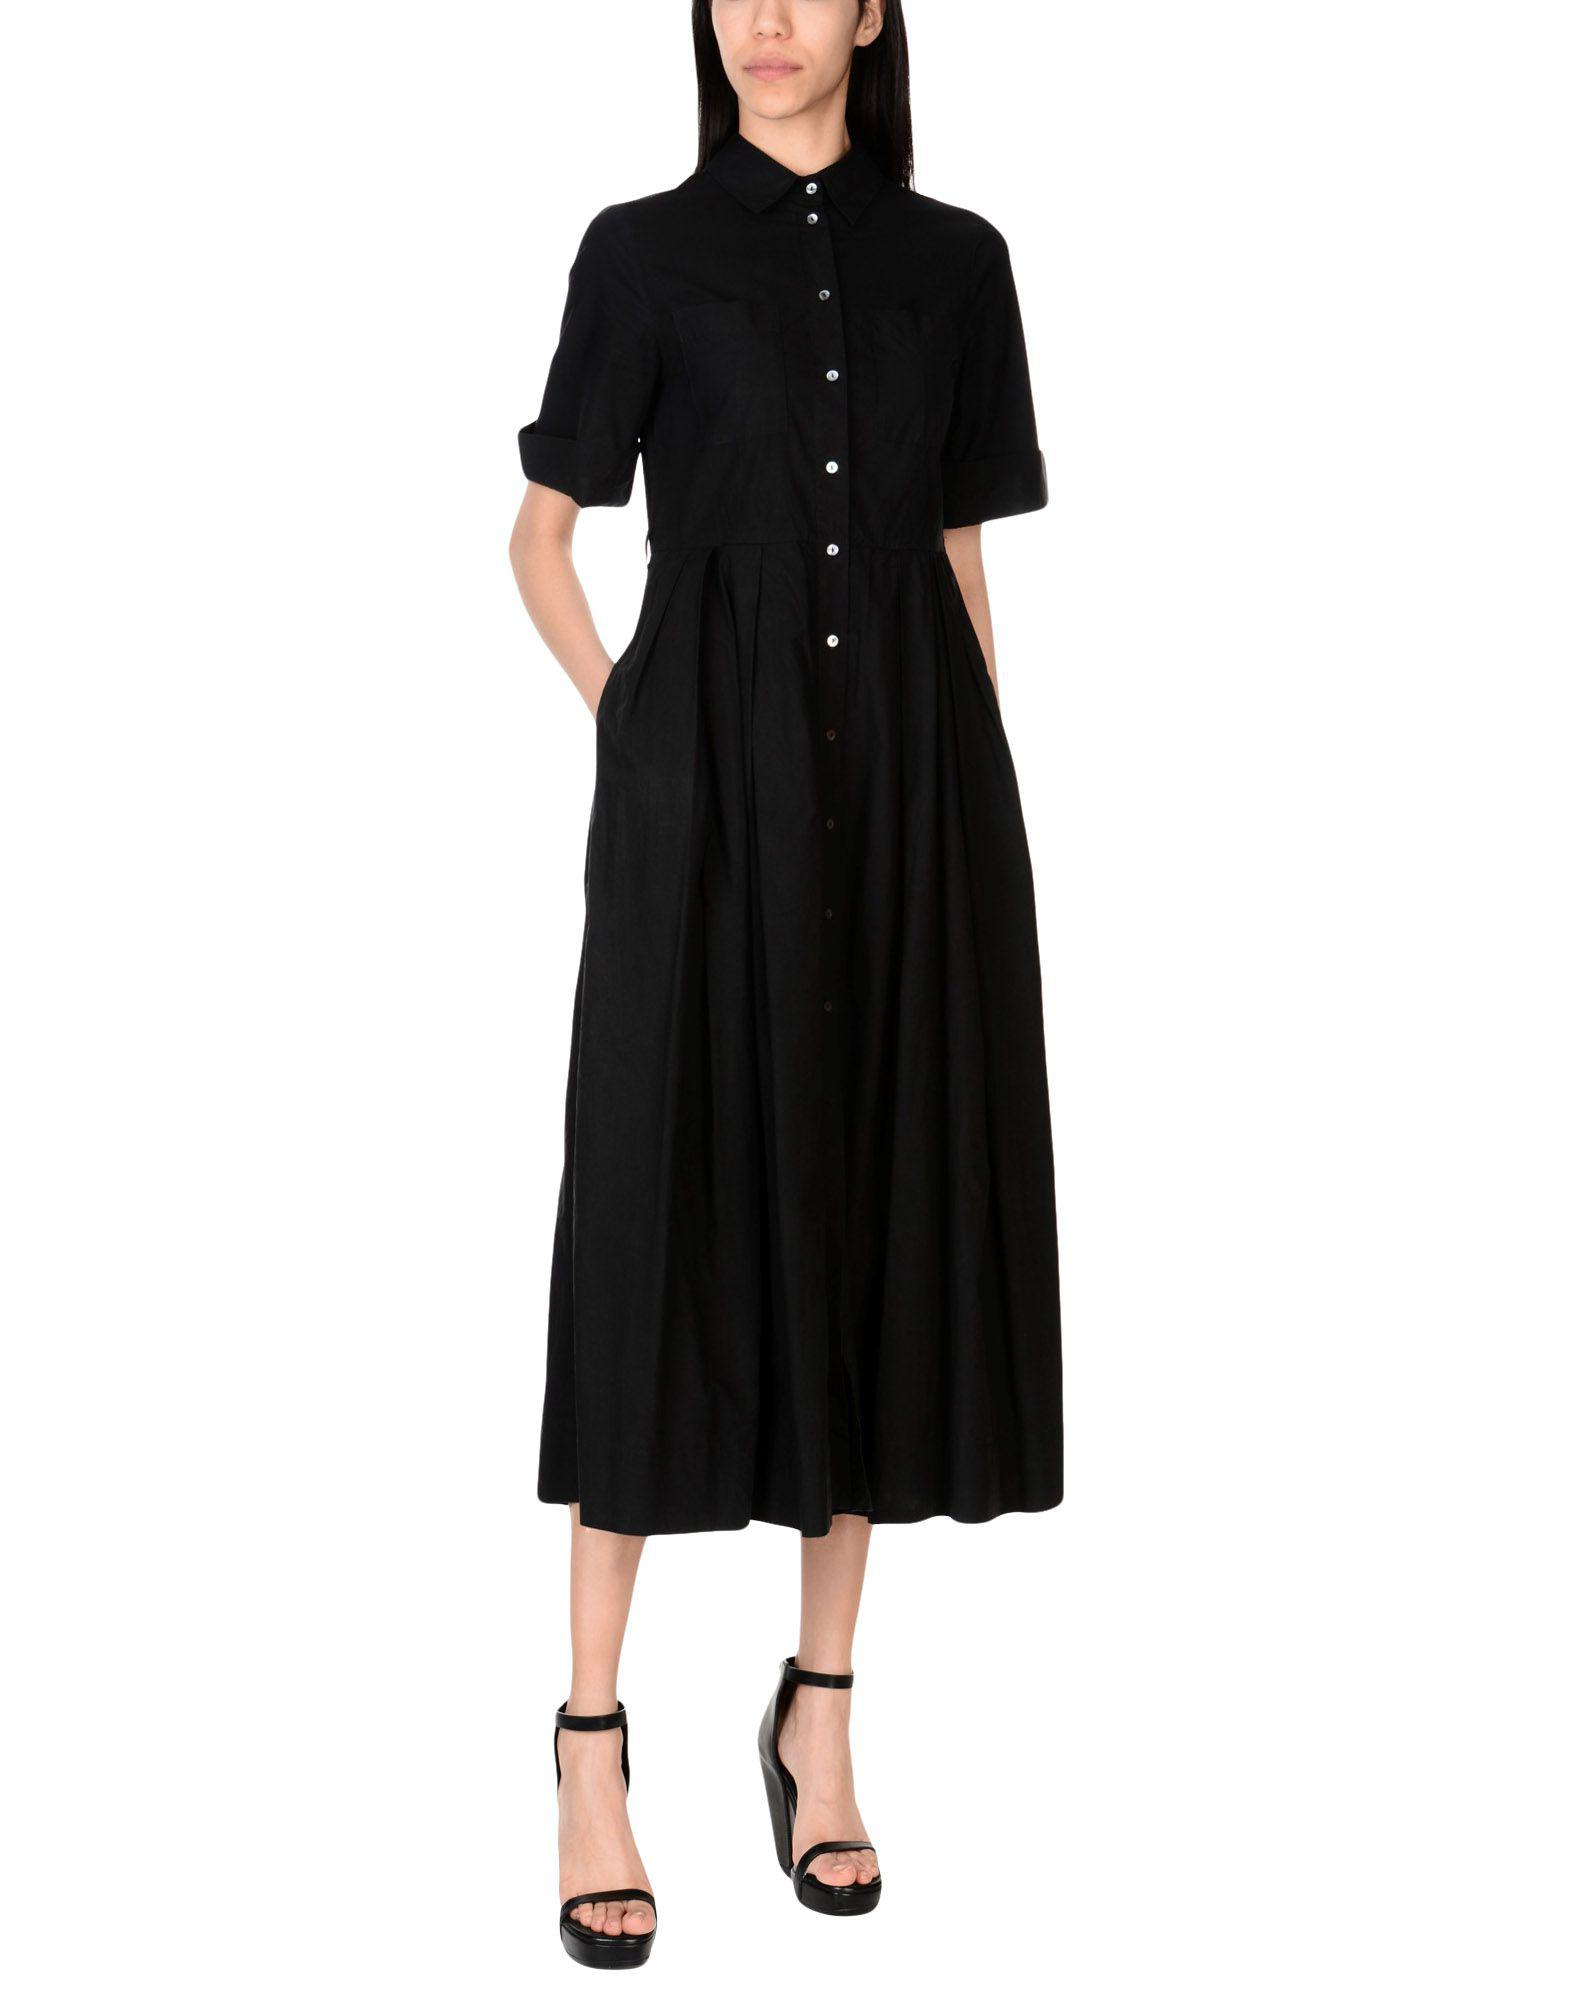 Attic And Barn 3/4 Length Dress in Black - Lyst